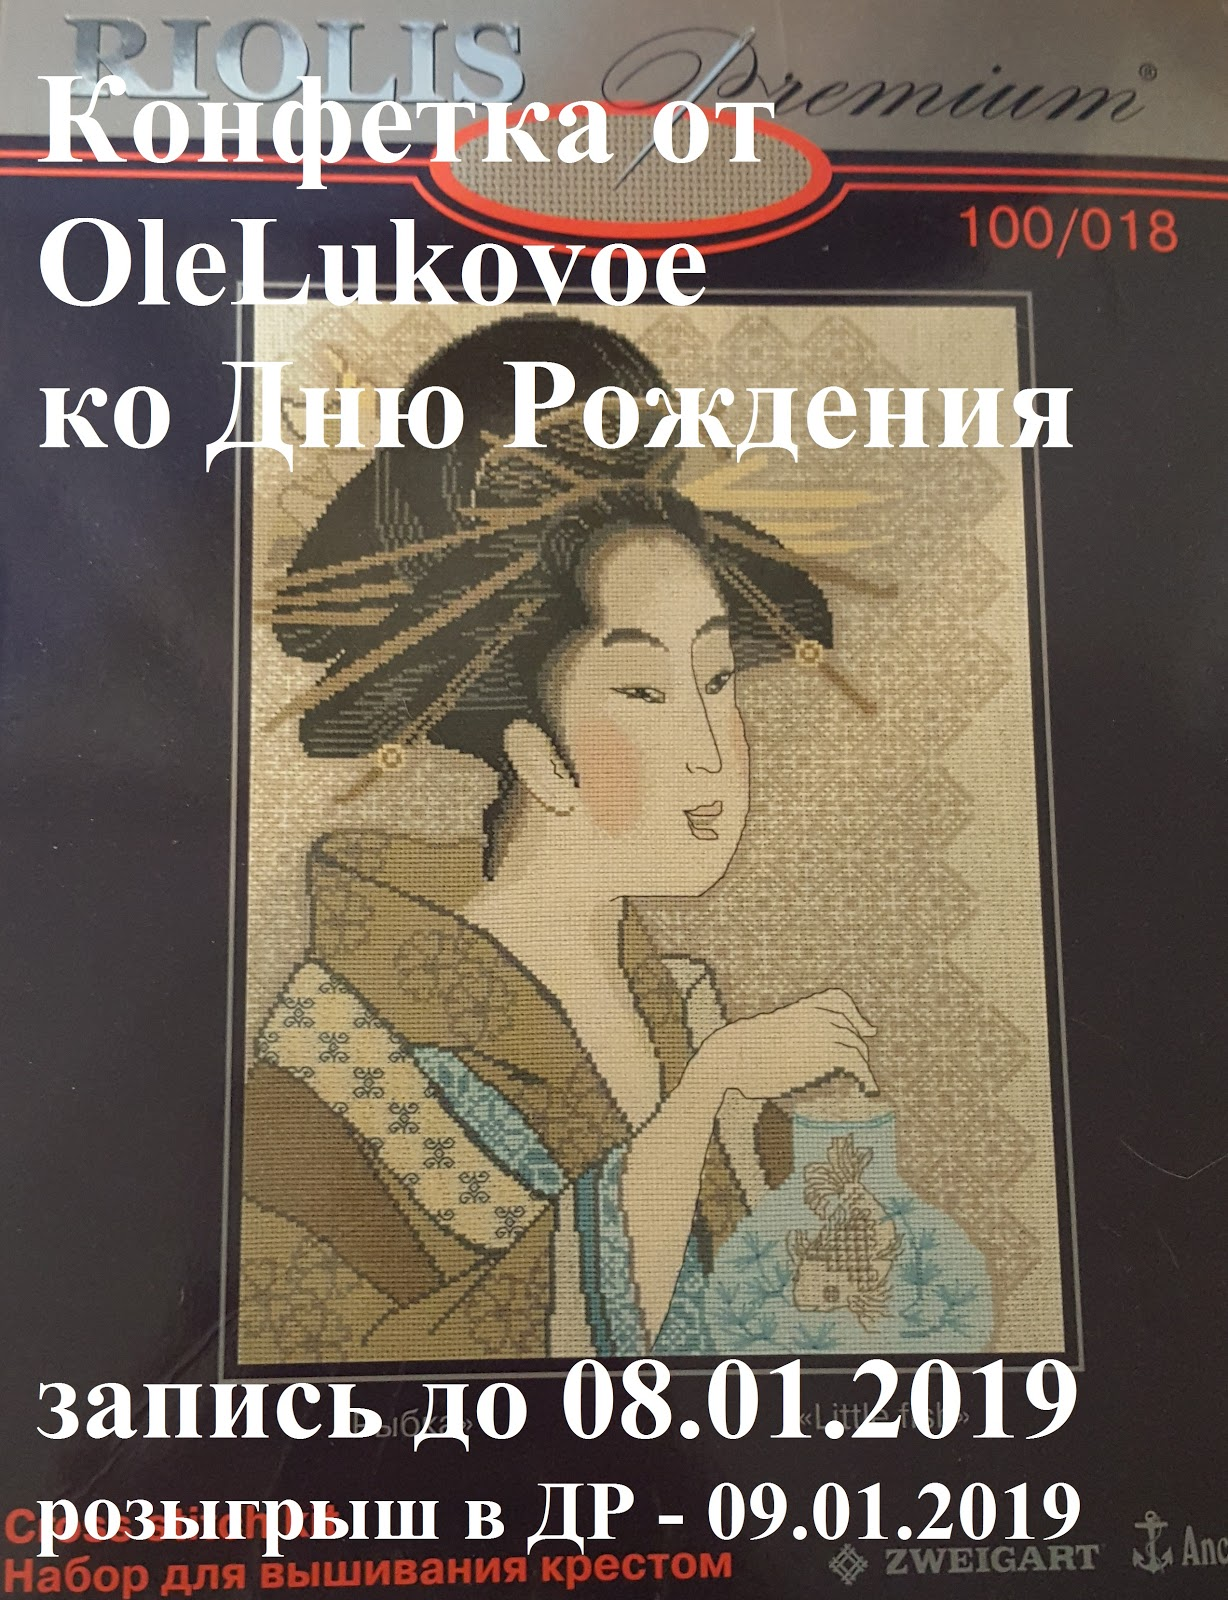 Восточная конфетка от Оли 09.01.2019